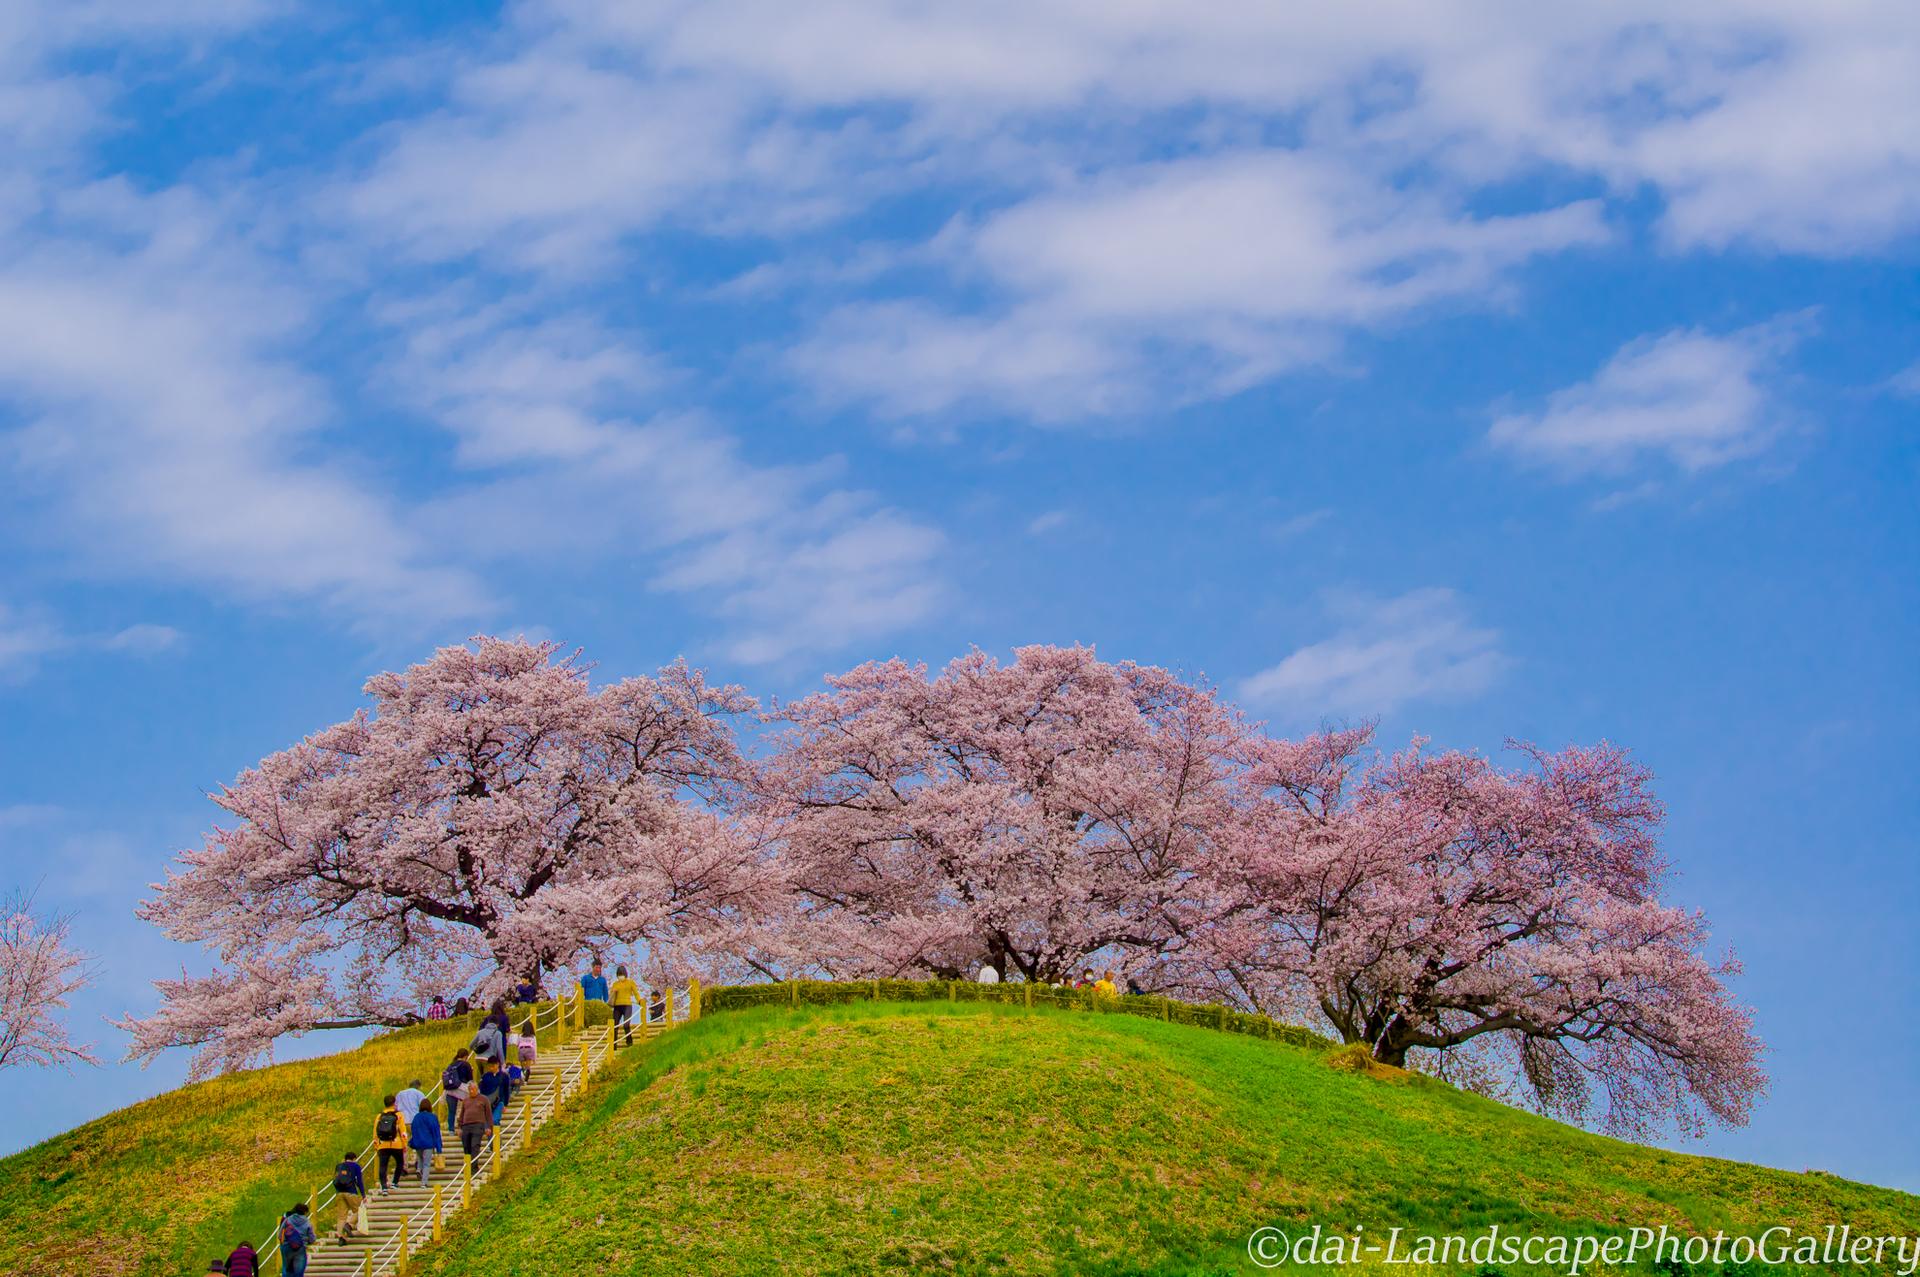 丸墓山古墳の桜風景【HDRi】